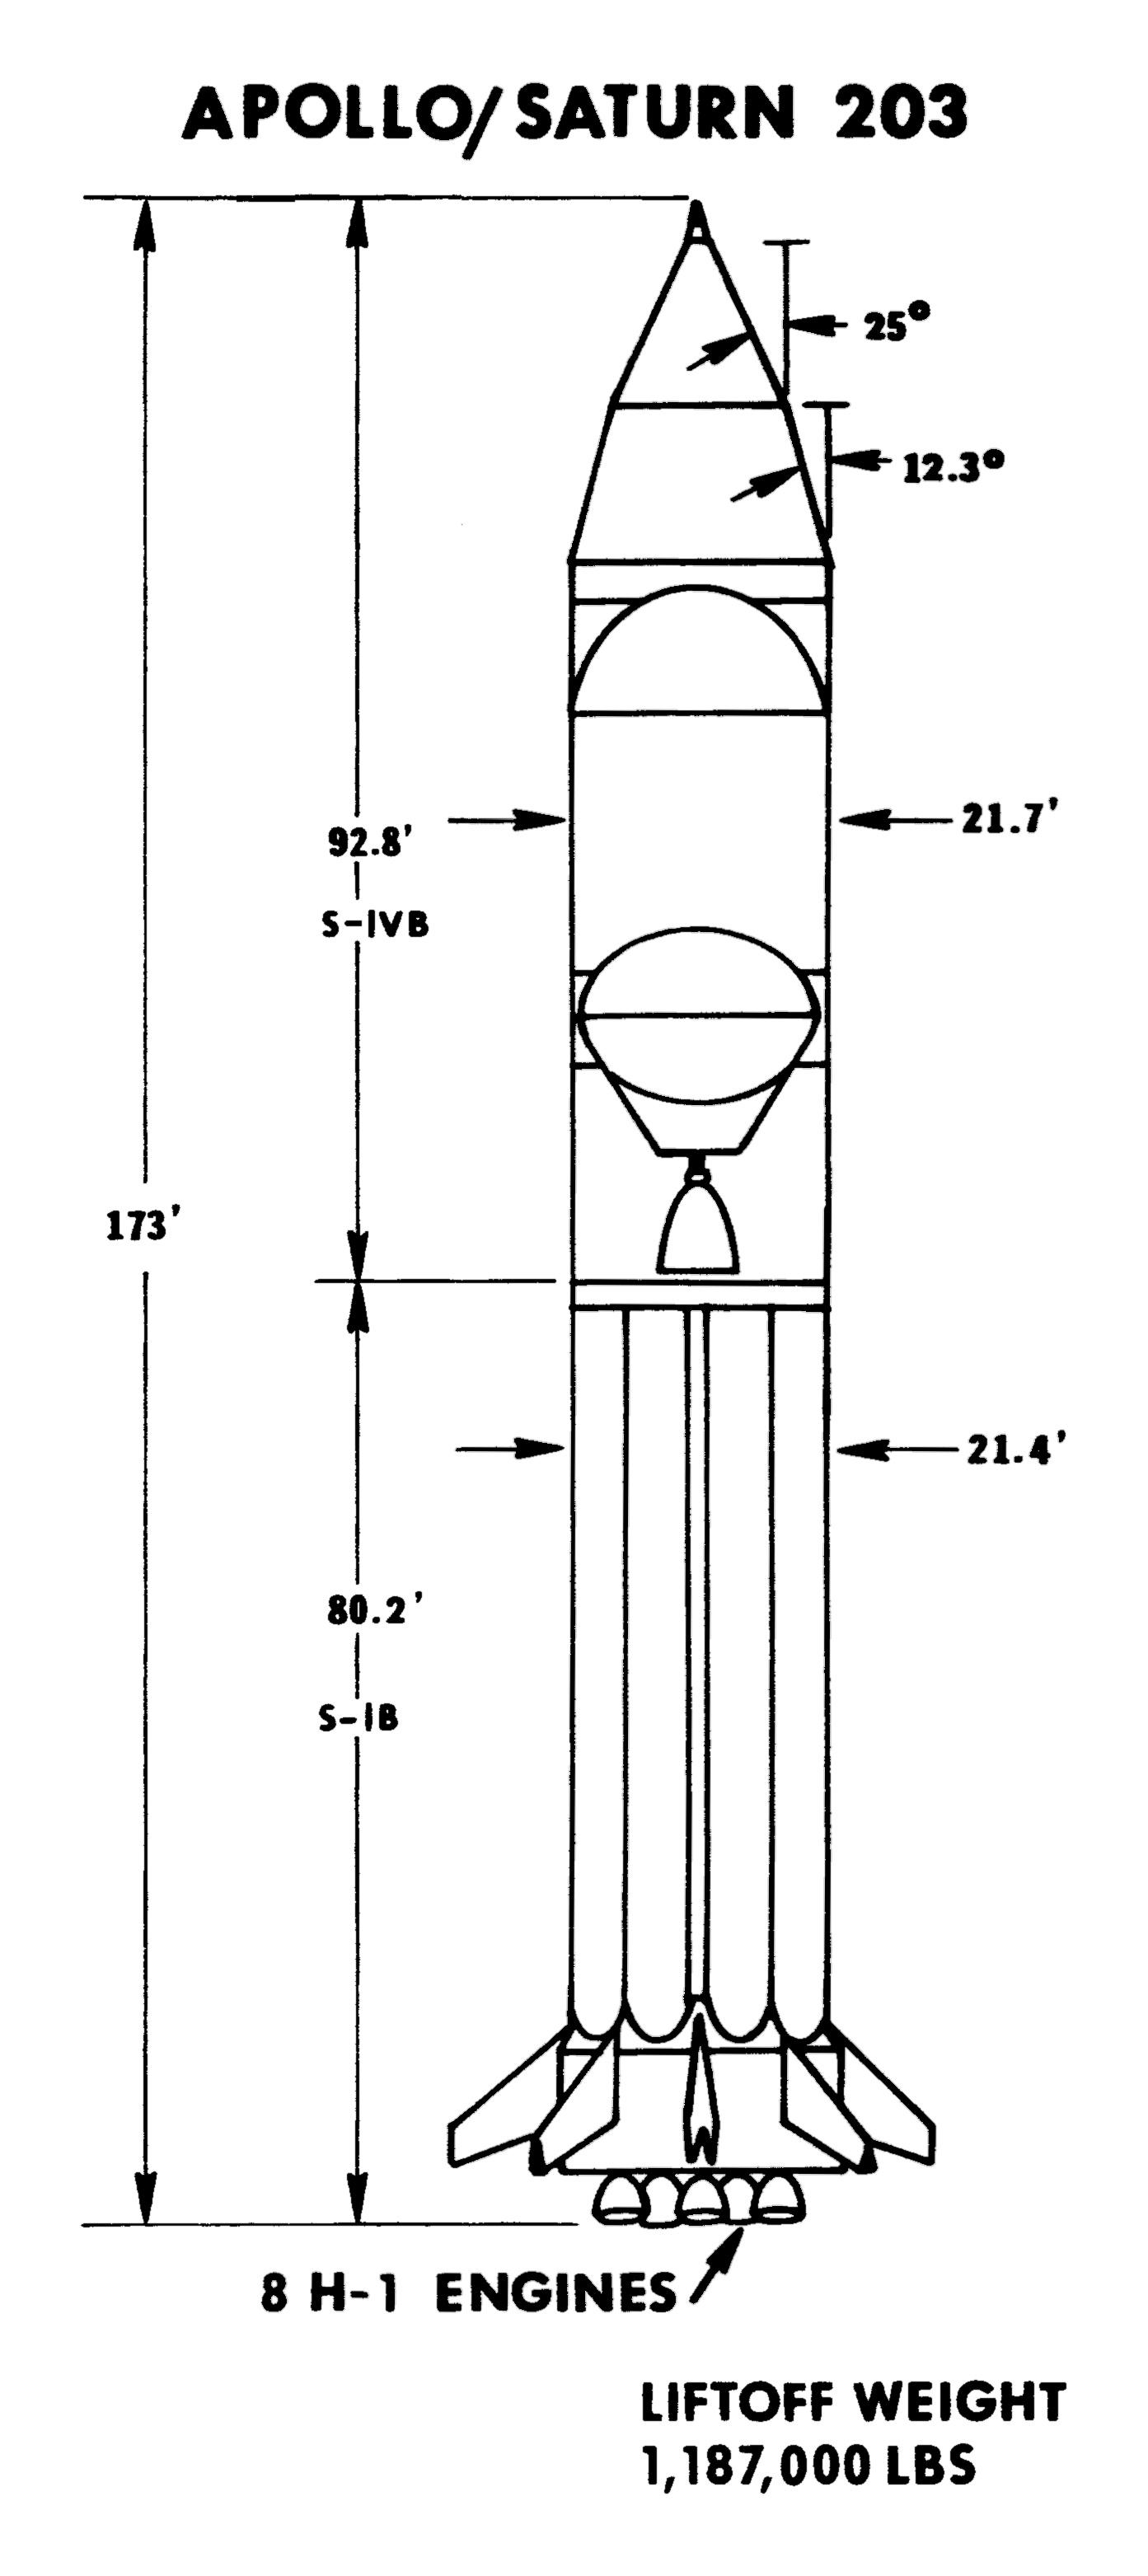 general saturn ib diagrams saturn ib as 203 aka sa 203 the liquid hydrogen experiment